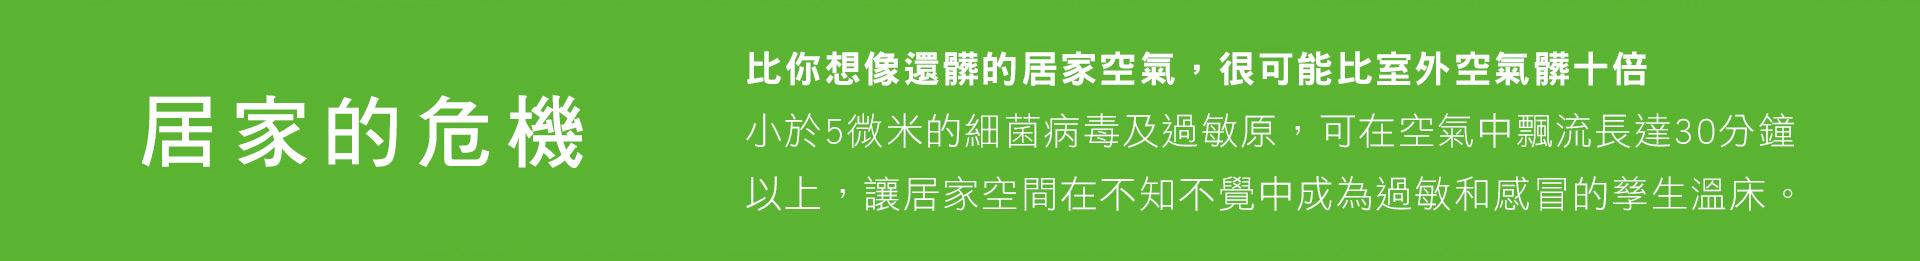 NEW週年慶LP_PC_20191112_v4_06